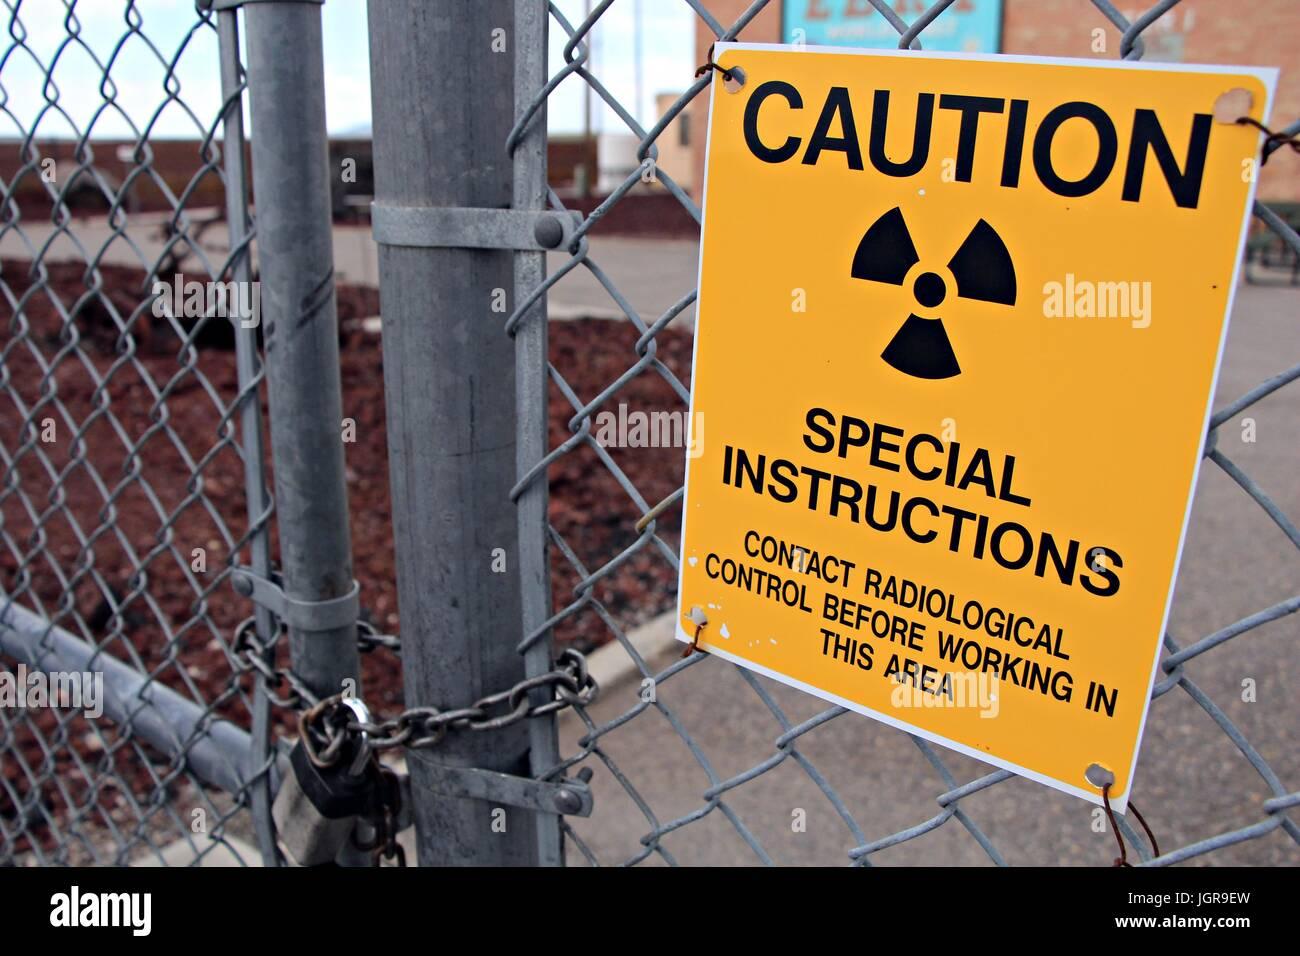 Radiological warning sign on a padlocked fence - Stock Image